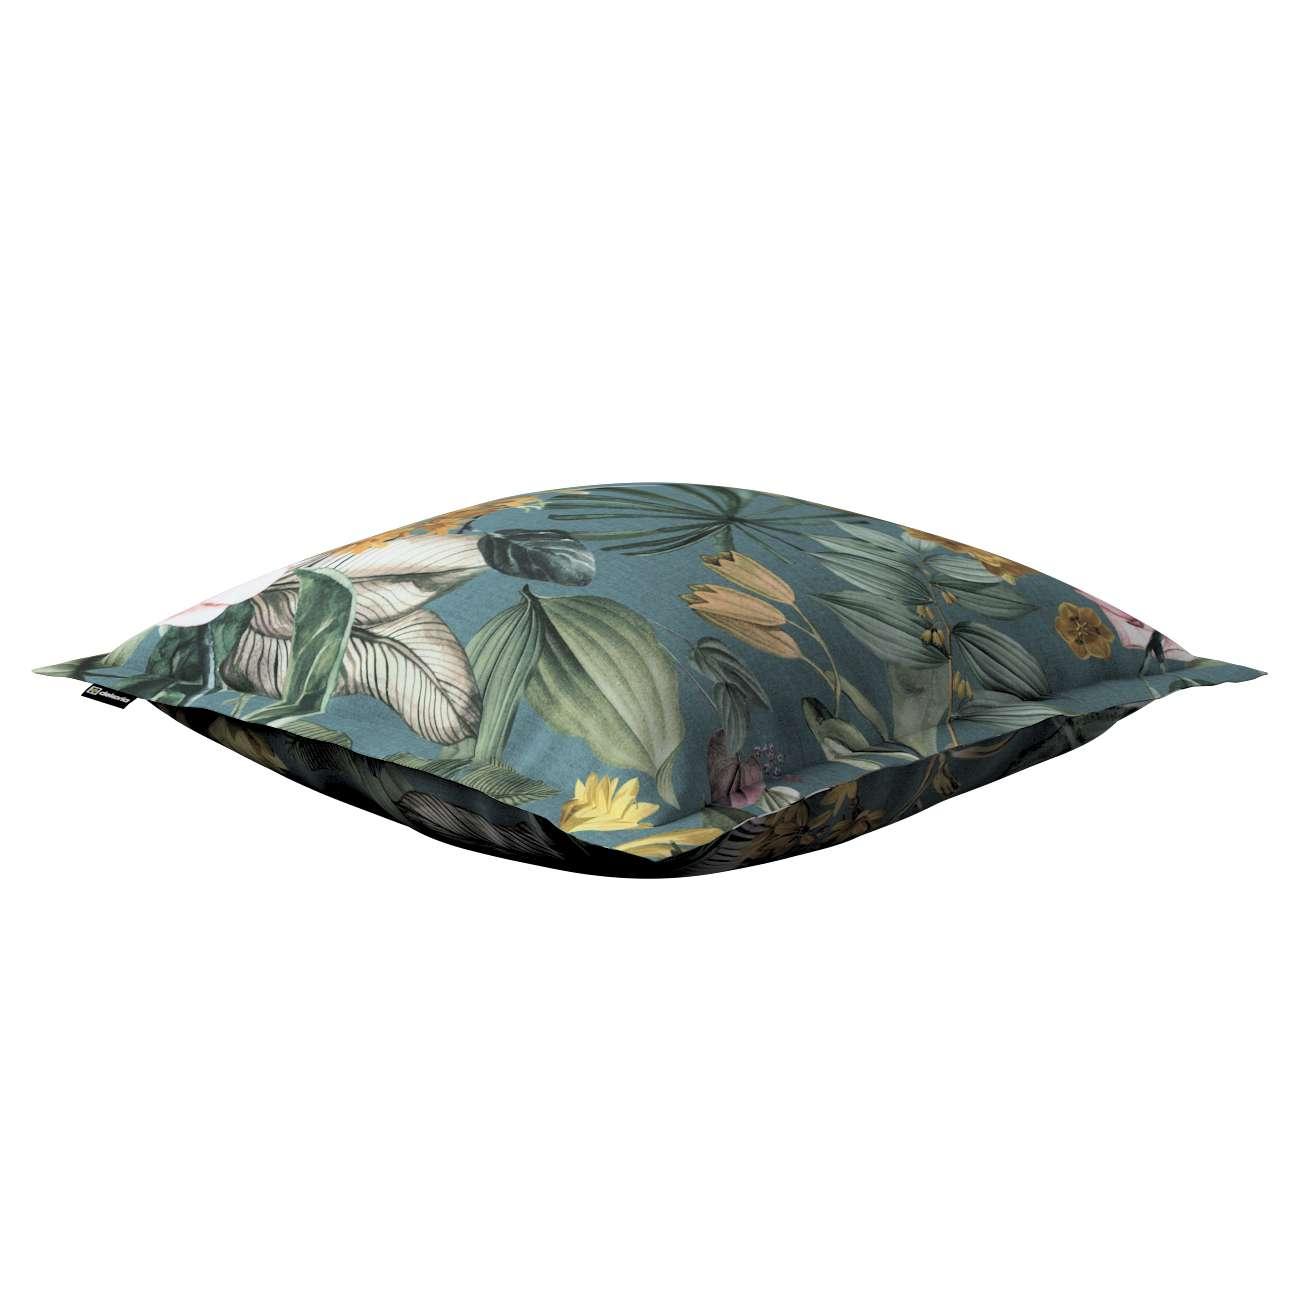 Mona - potah na polštář hladký lem po obvodu v kolekci Abigail, látka: 143-24